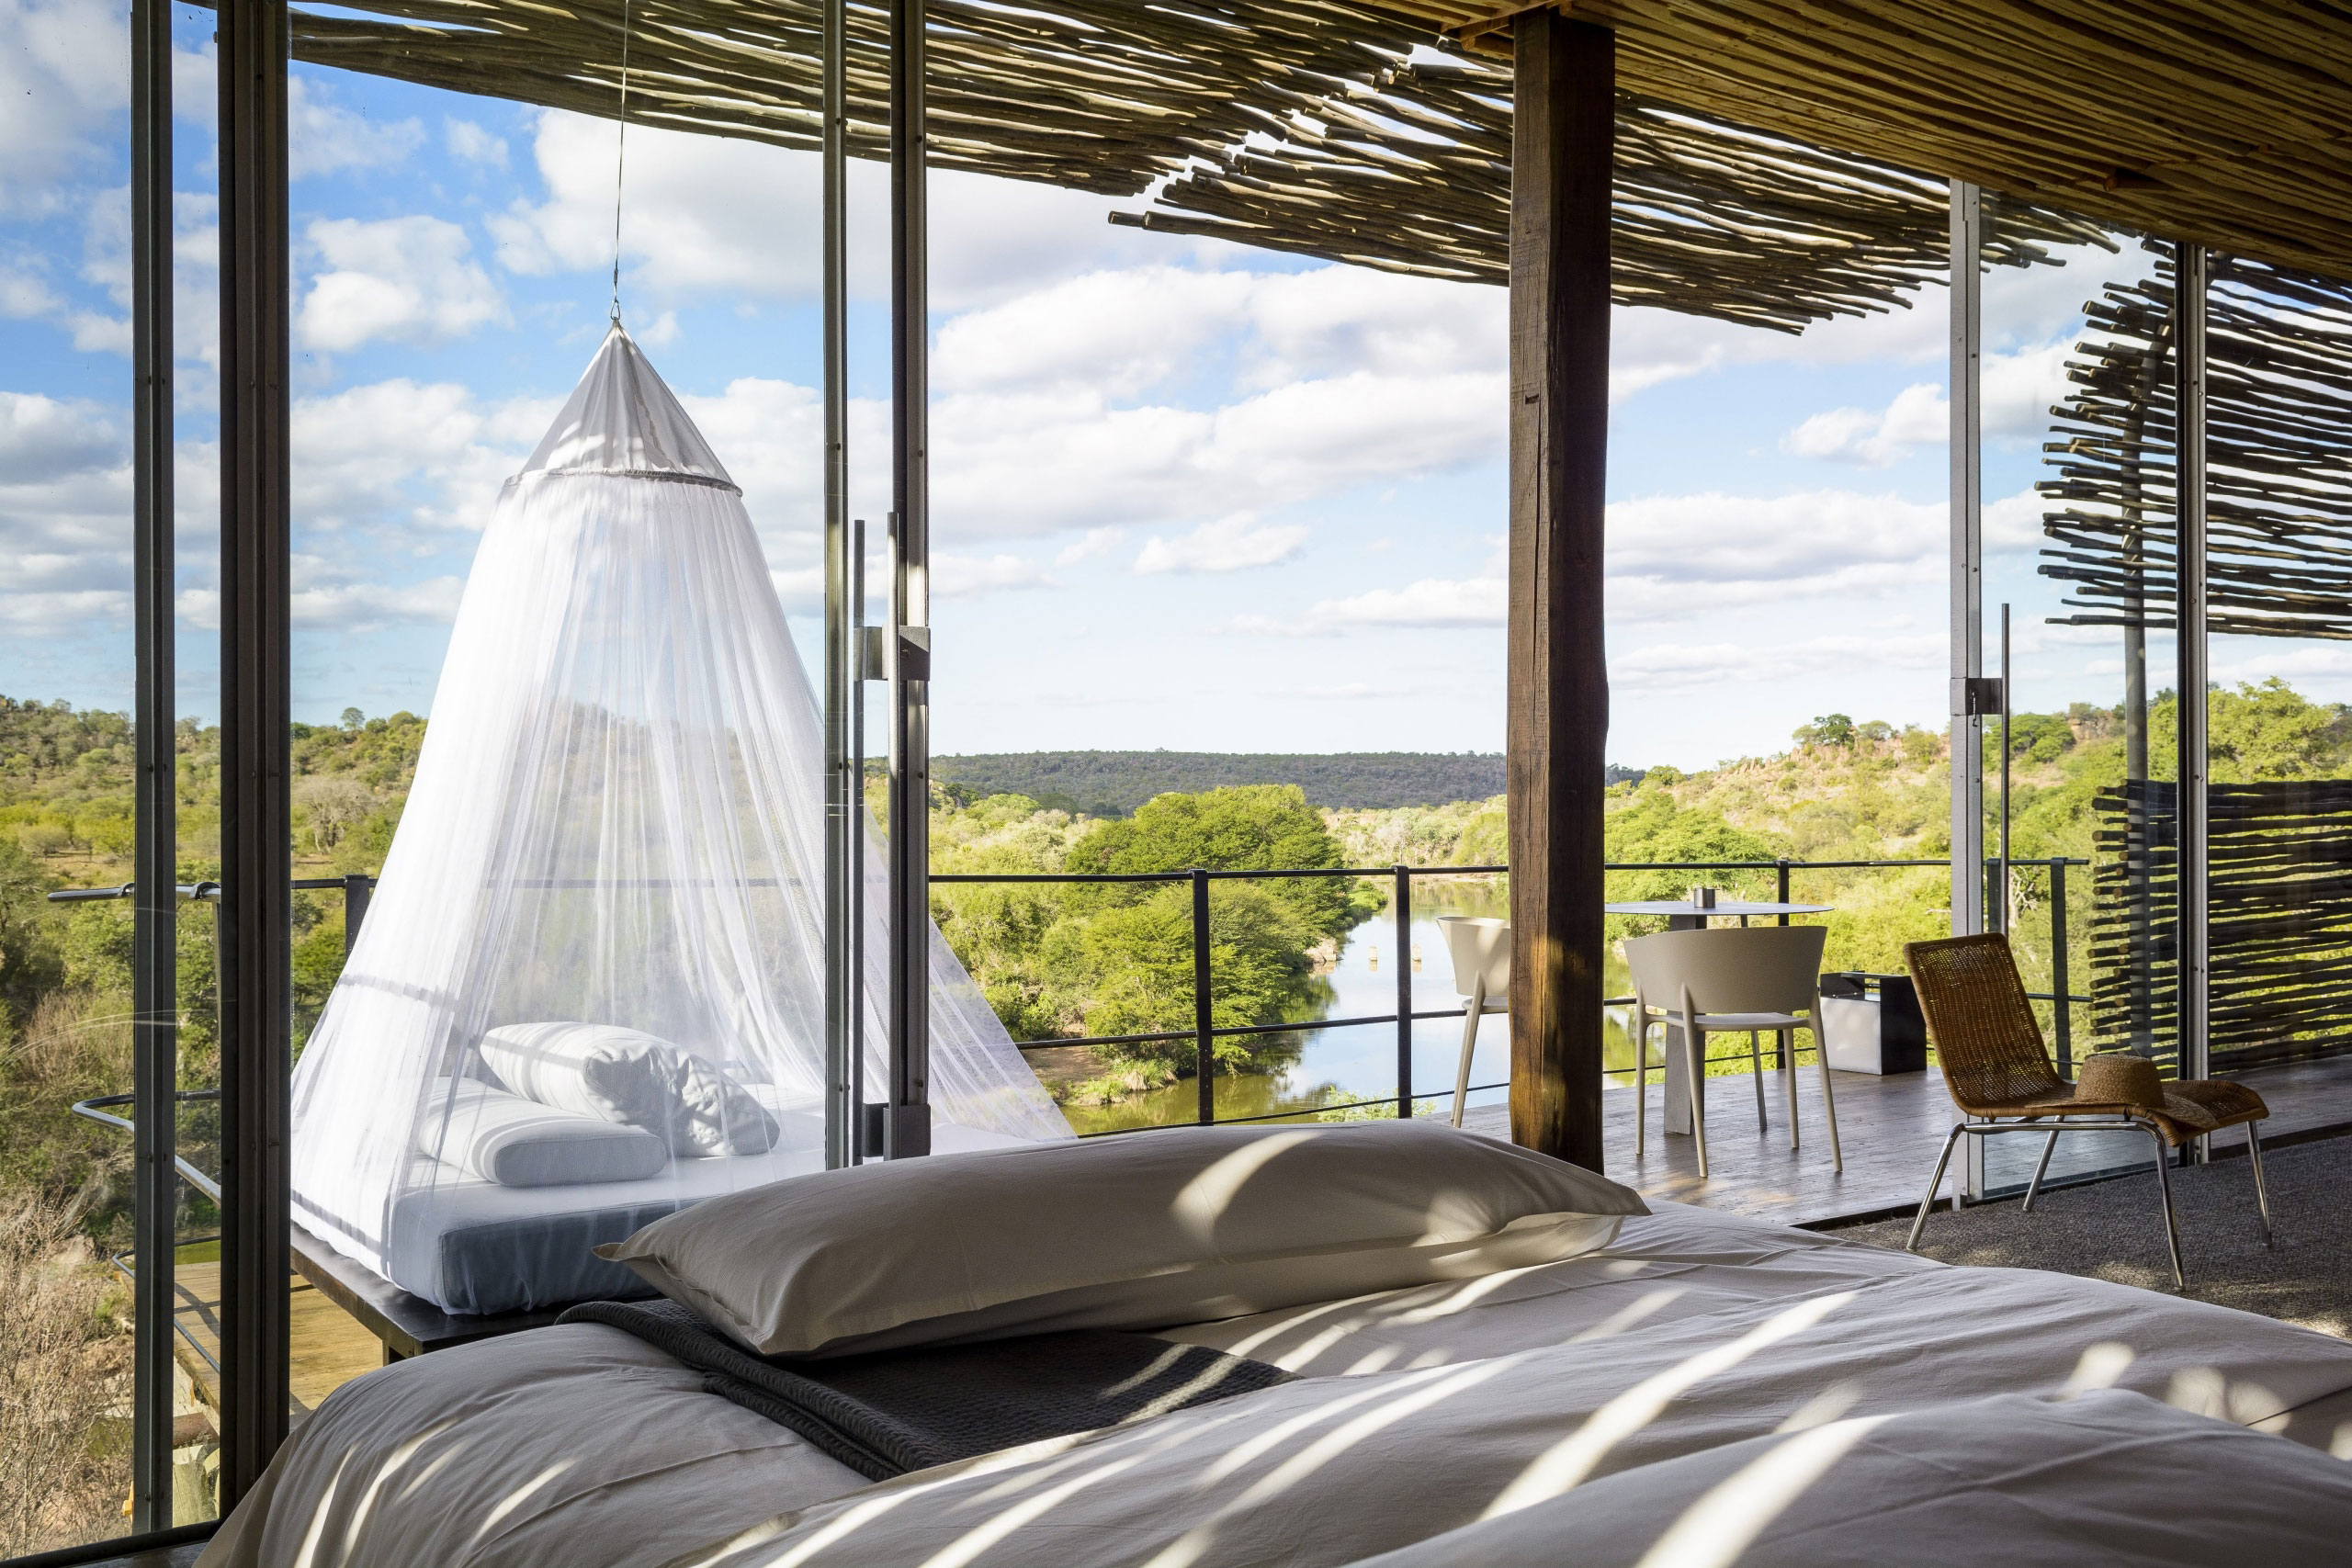 Singita-Lebombo-Kruger-South-Africa-sudafrica-view--enkosi-africa-Campamento-mejores-Vistas-África